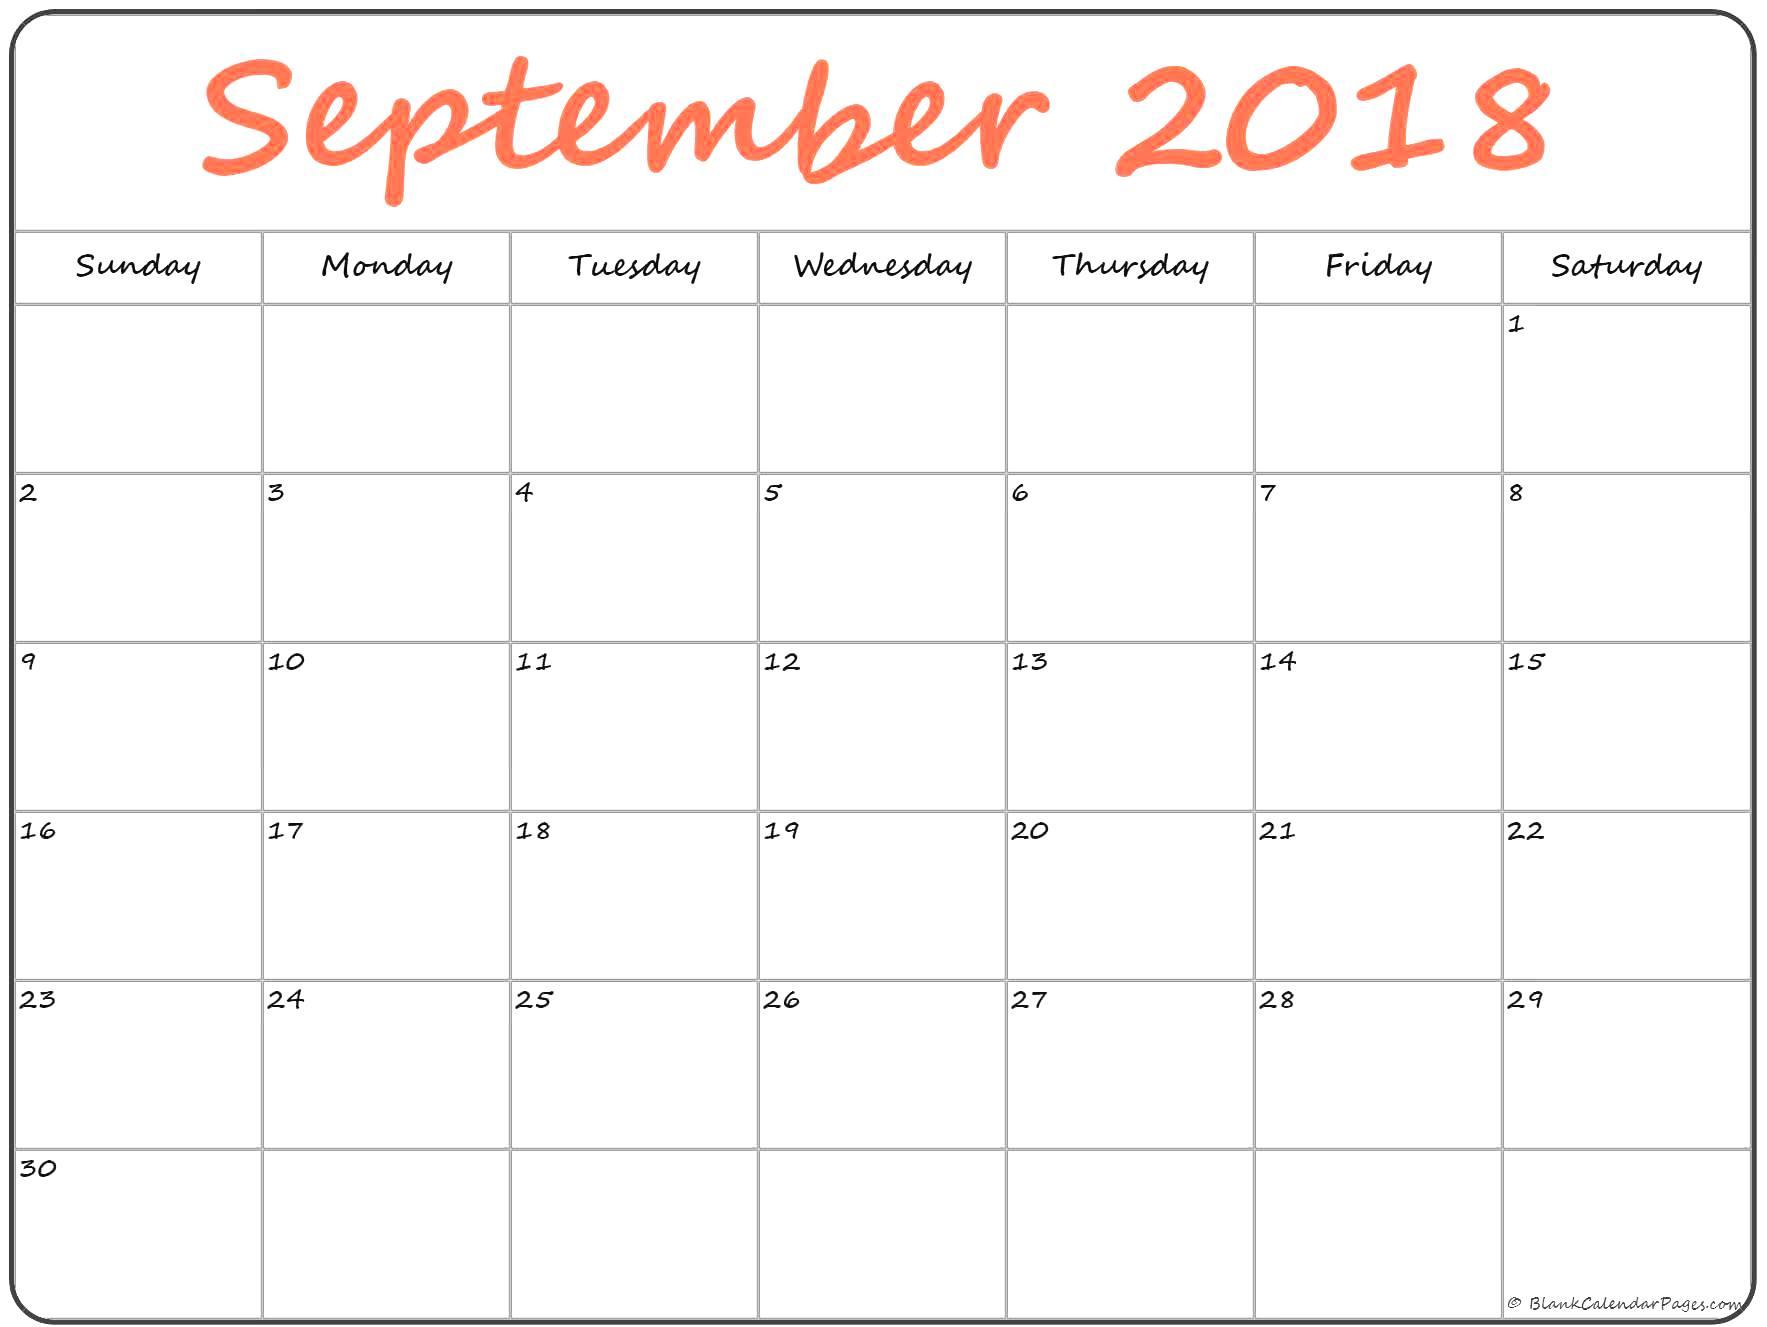 Free September 2018 Calendar Printable Online Download regarding September Printable Monthly Calendars Blank